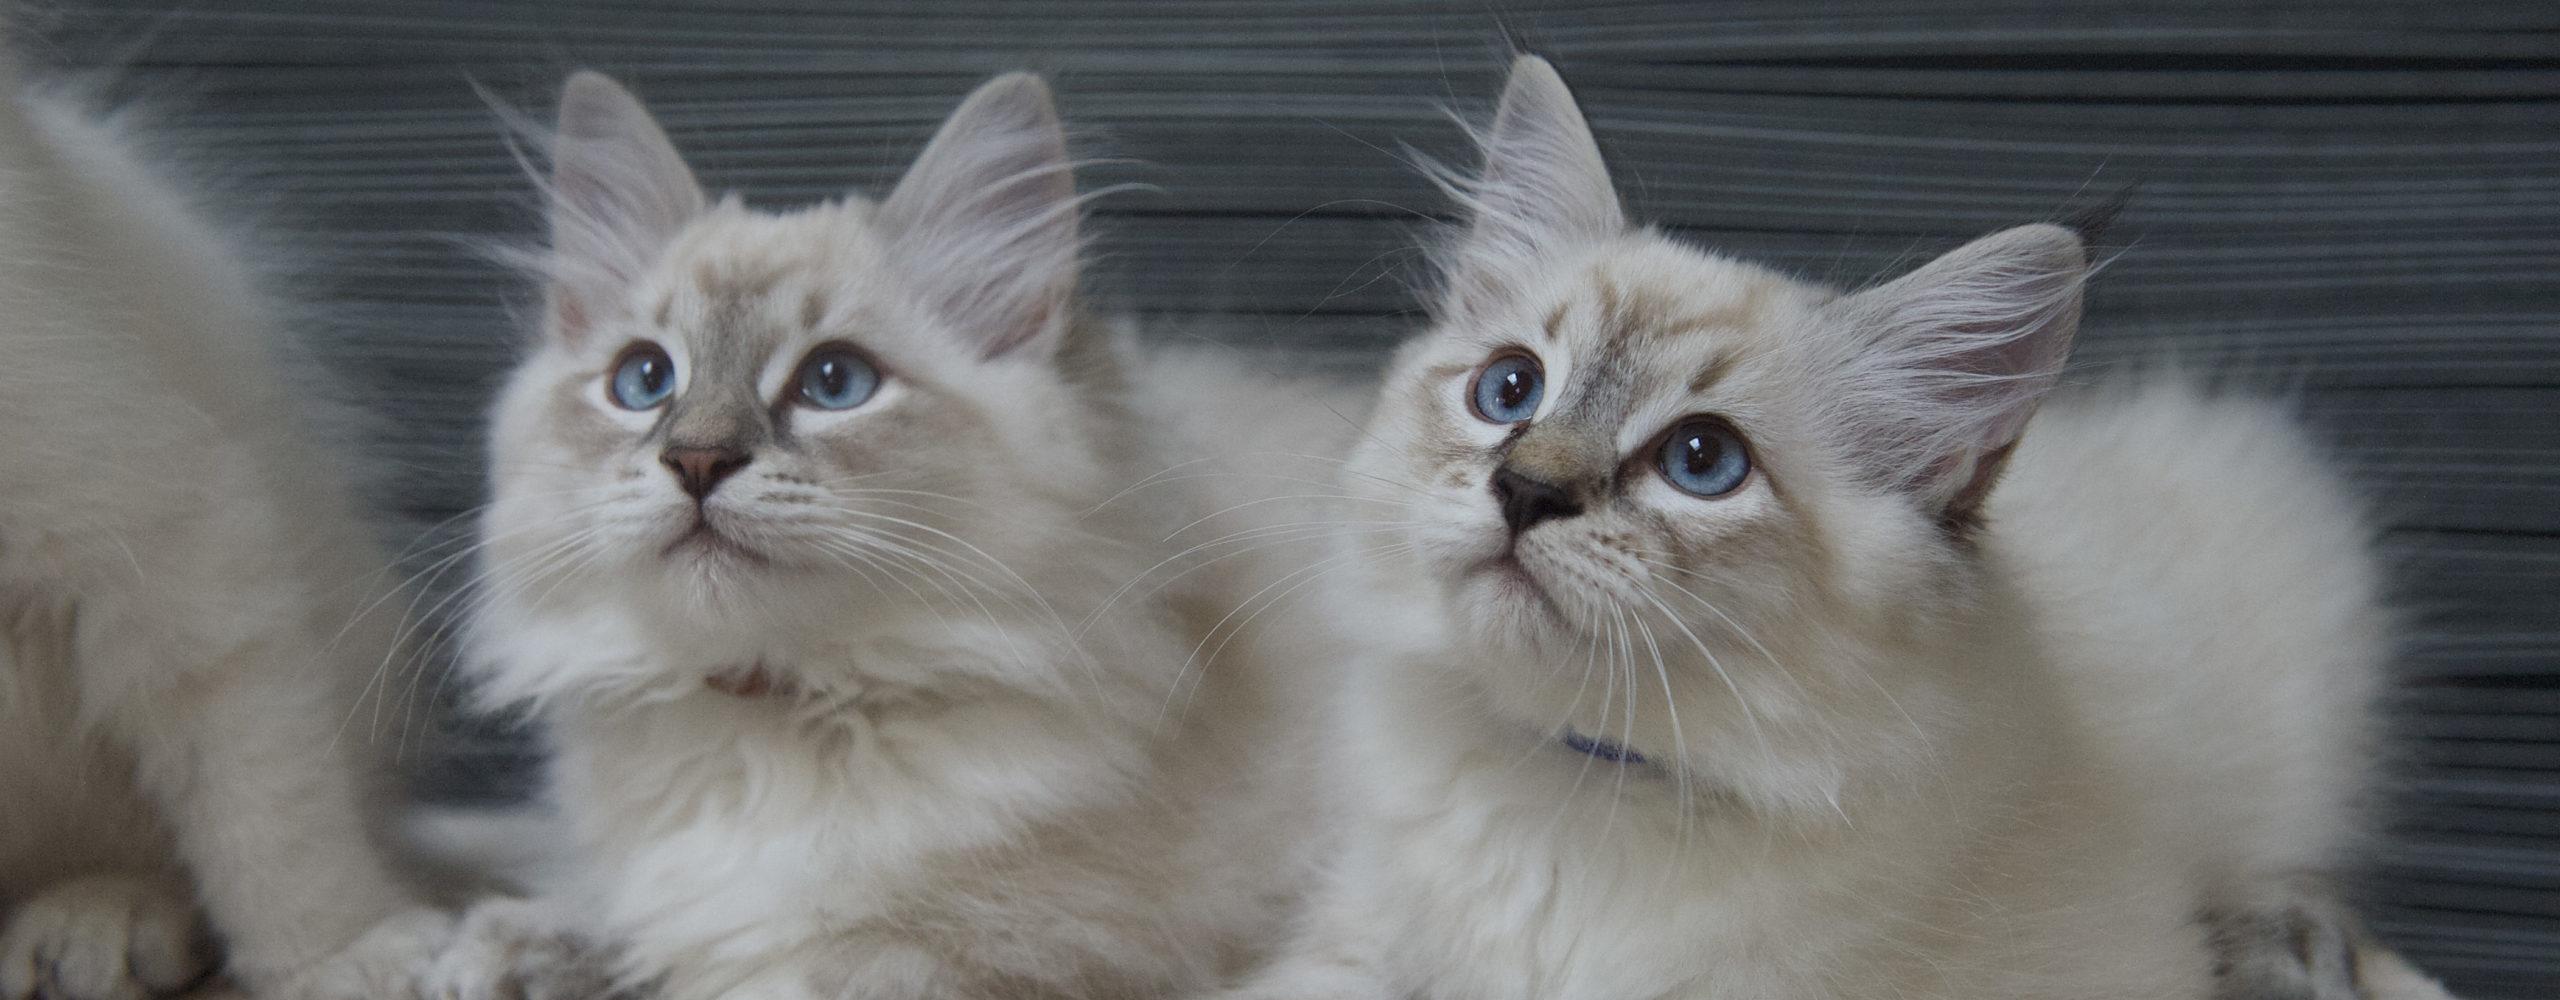 chatons neva masquerade